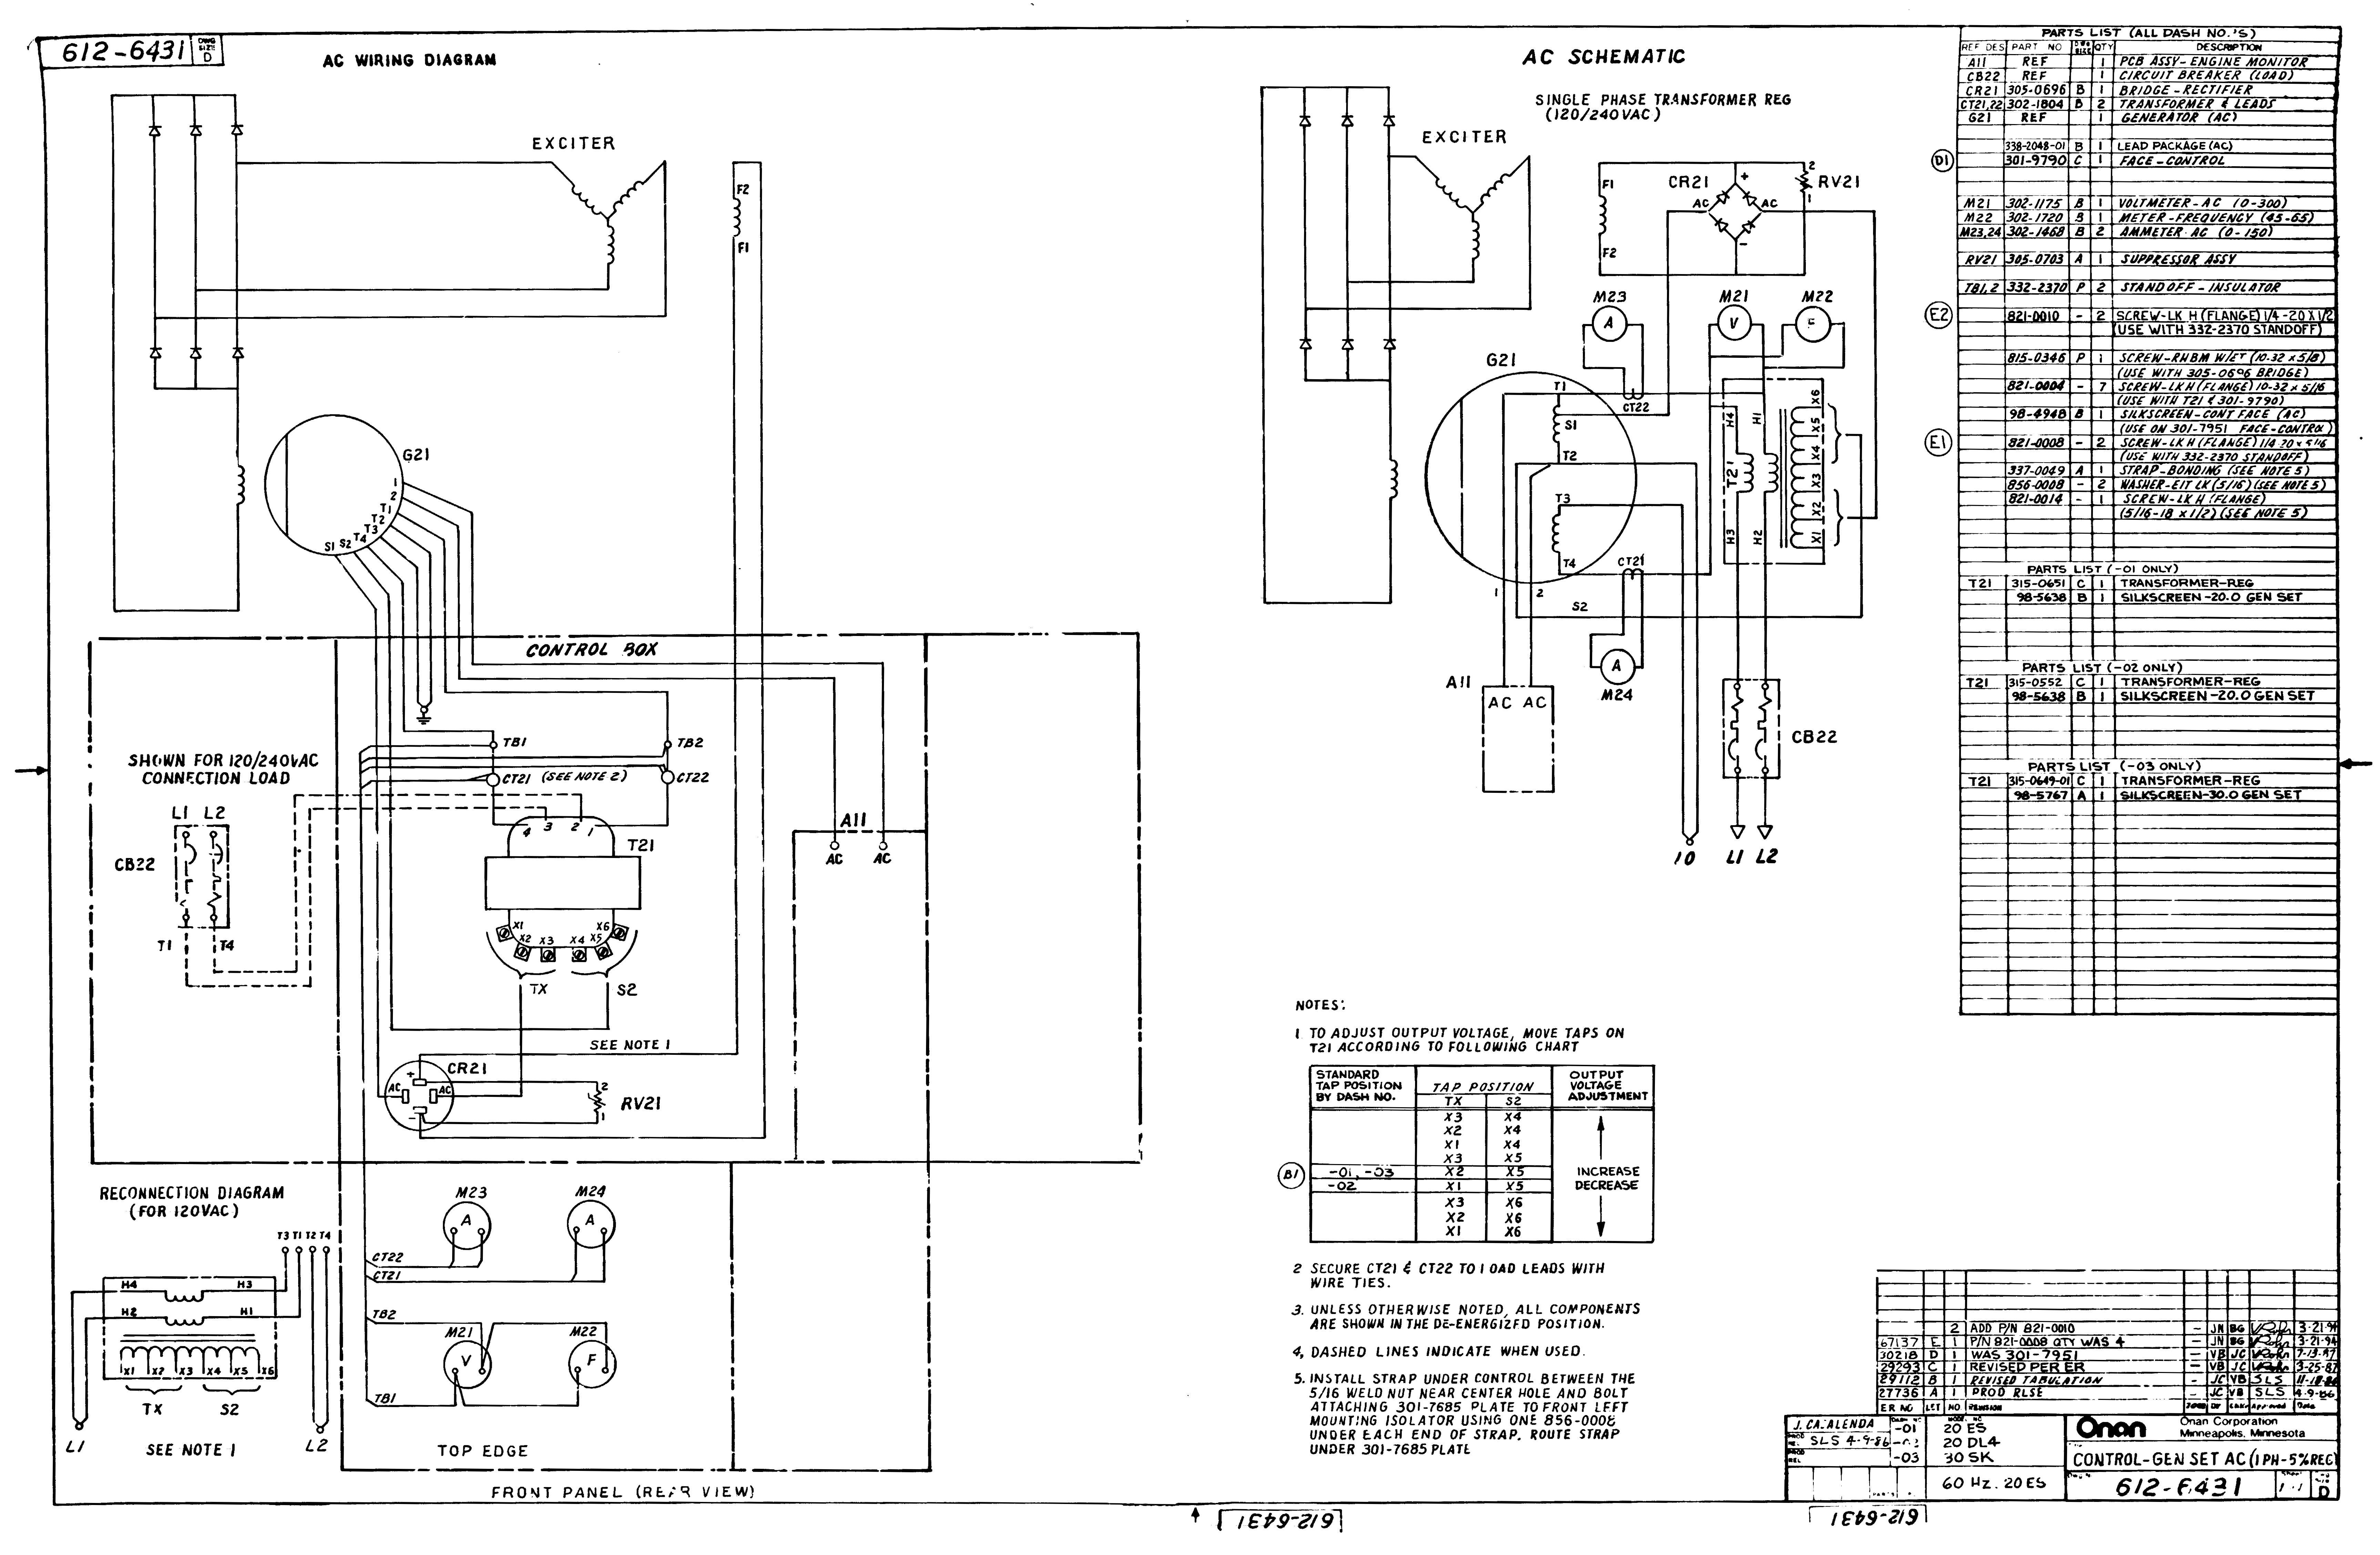 Onan Generator Wire Diagram Wiring Diagram An Generator Save An Generator Remote Start Wiring Of Onan Generator Wire Diagram